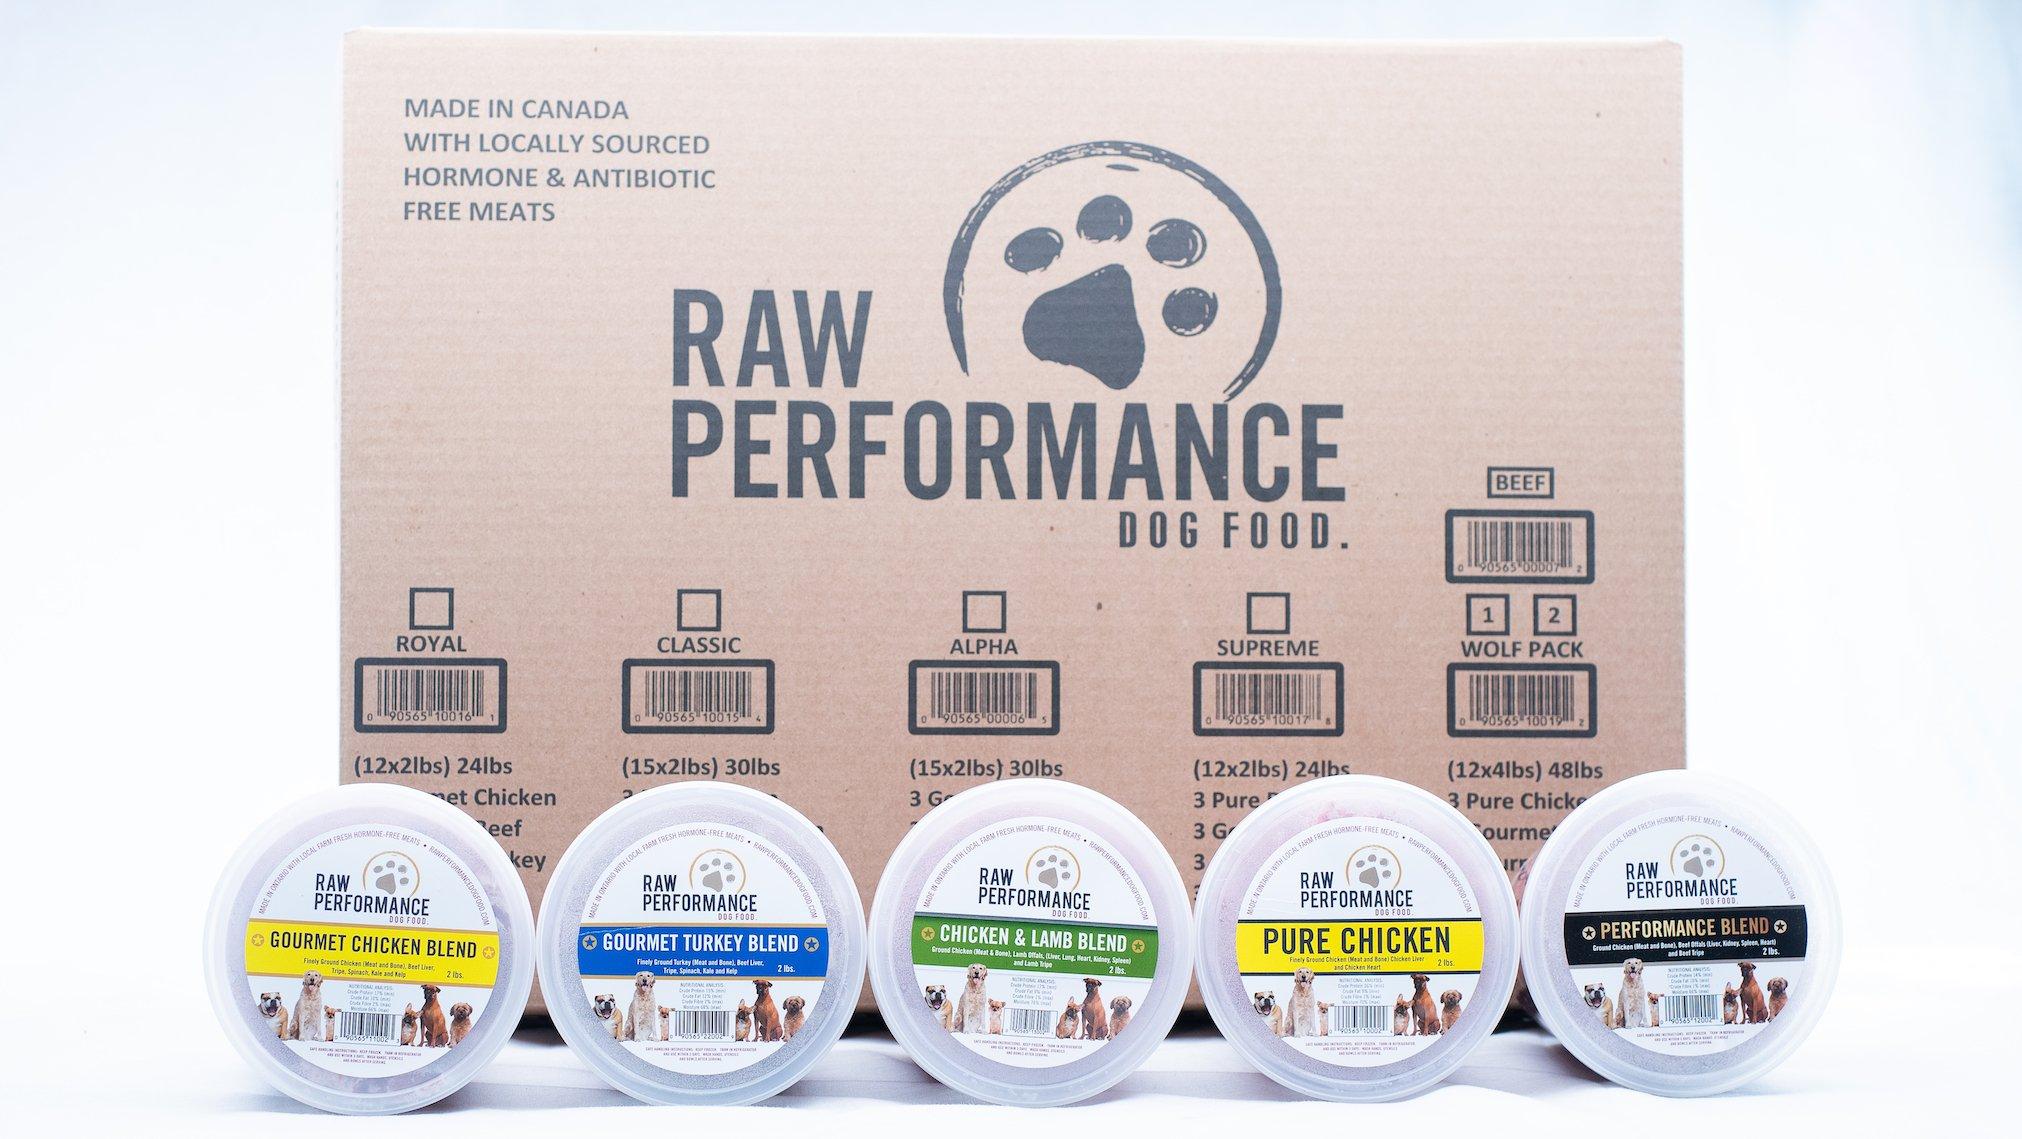 Raw Performance Variety Cases Classic 30-lb (15 x 2-lb) Dog Food